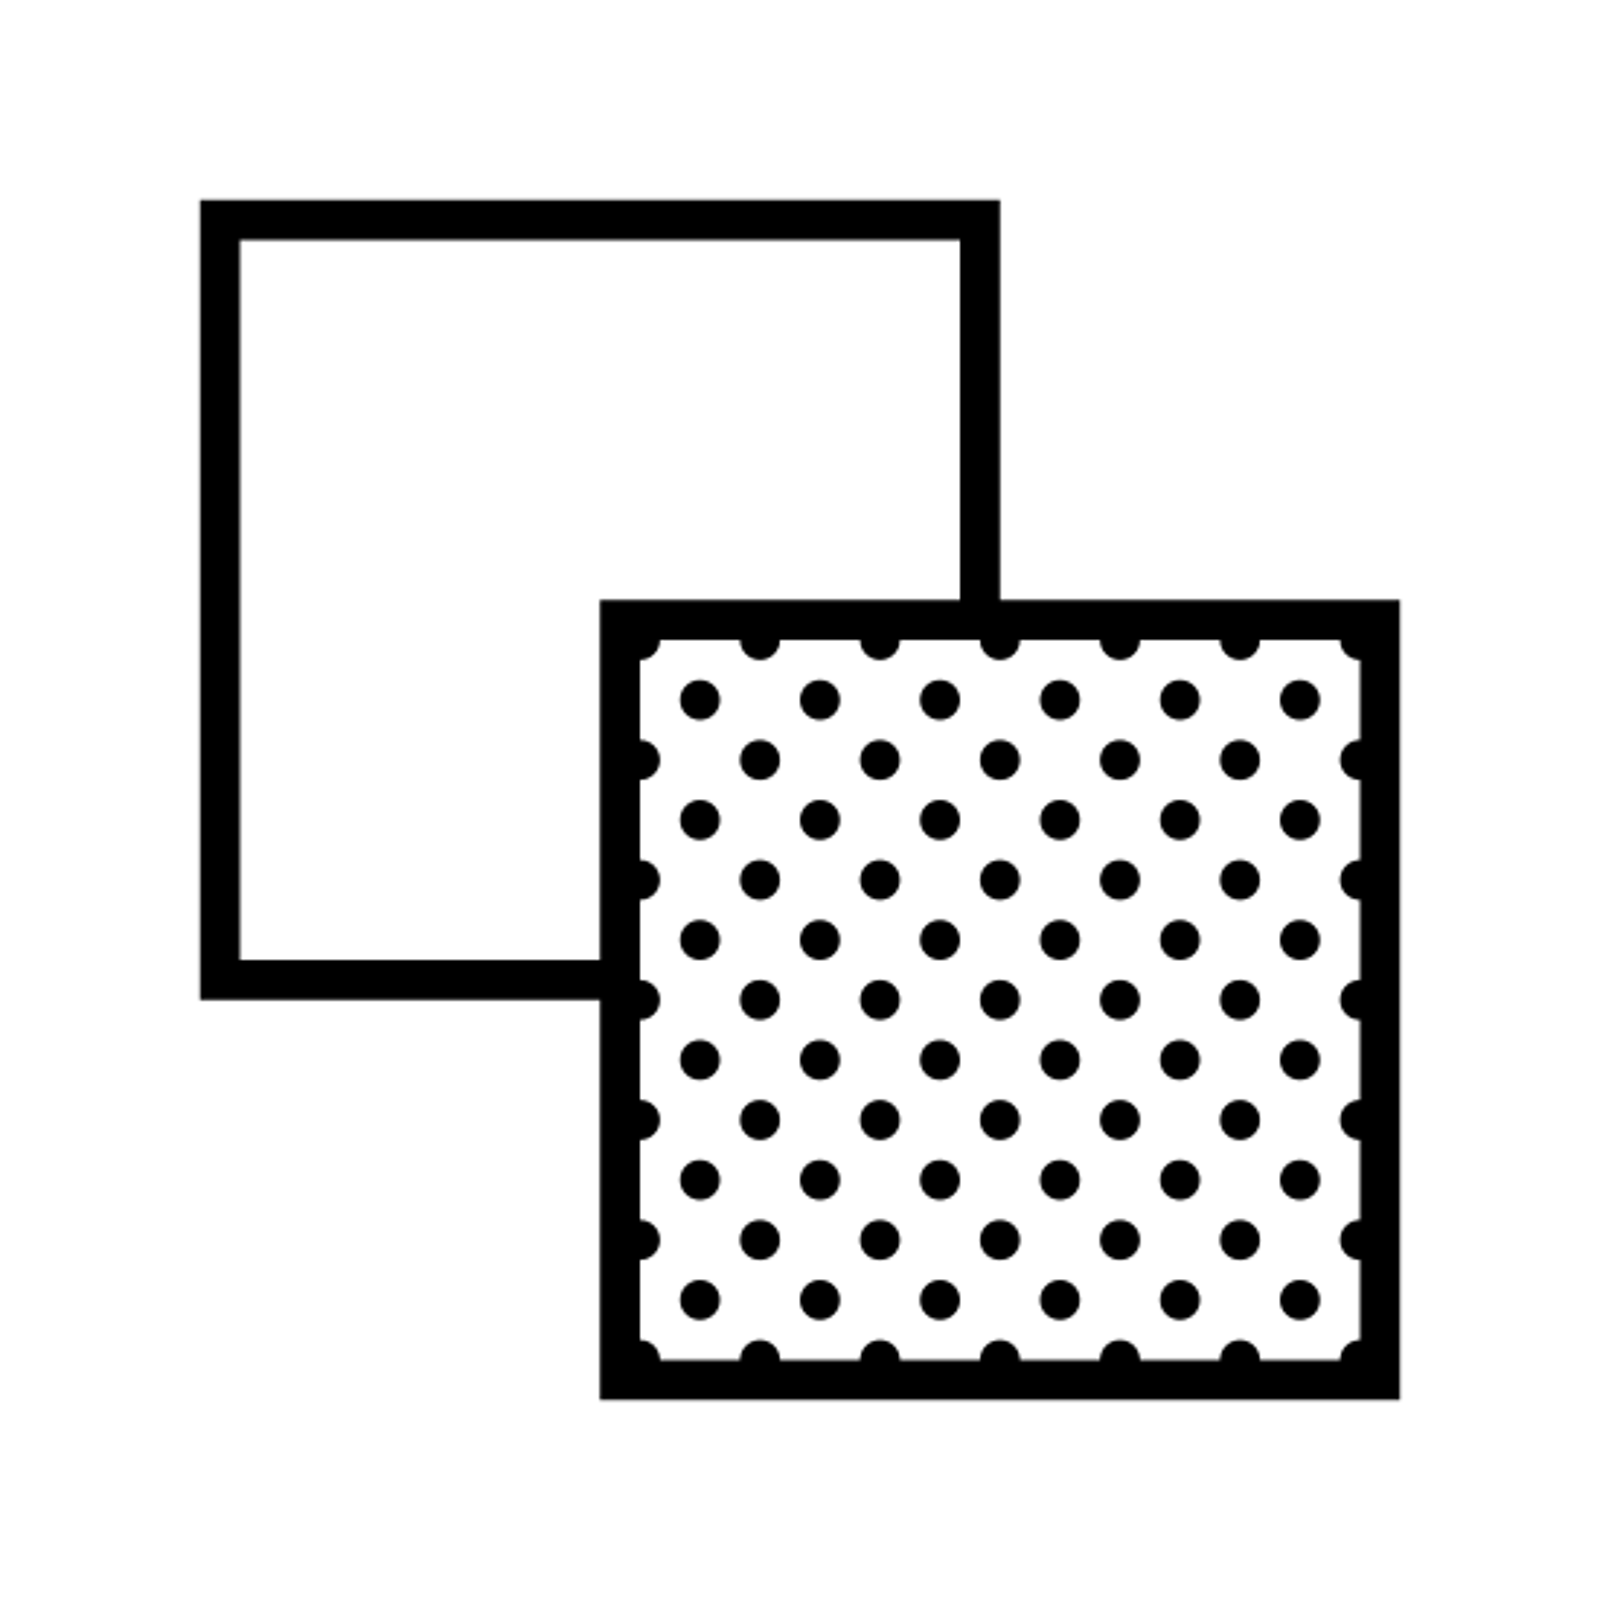 Send Backward icon